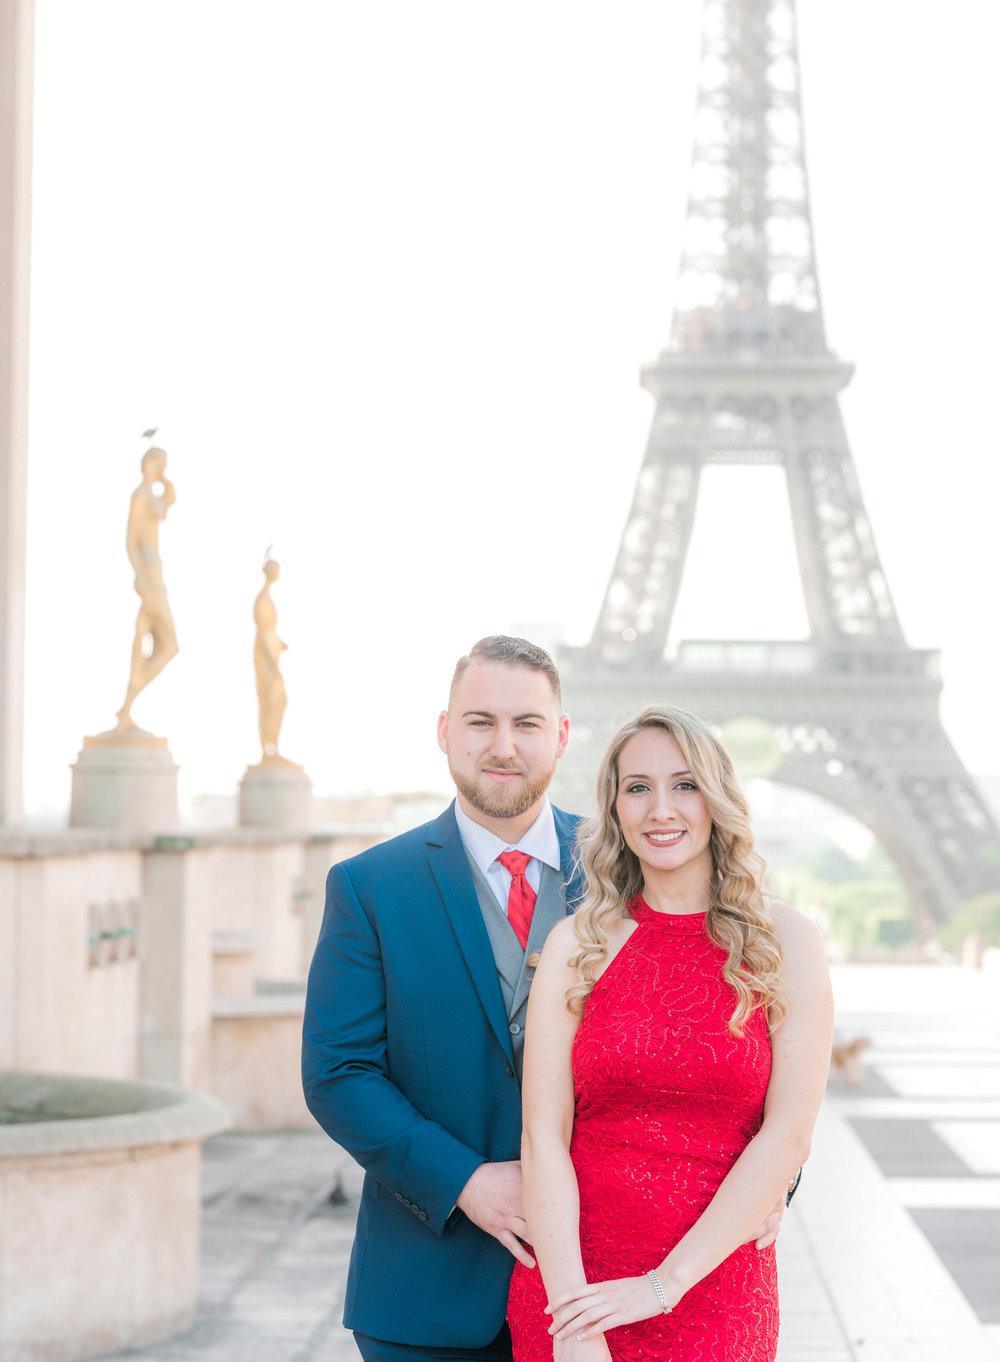 romantic engagement photo shoot in paris france at eiffel tower